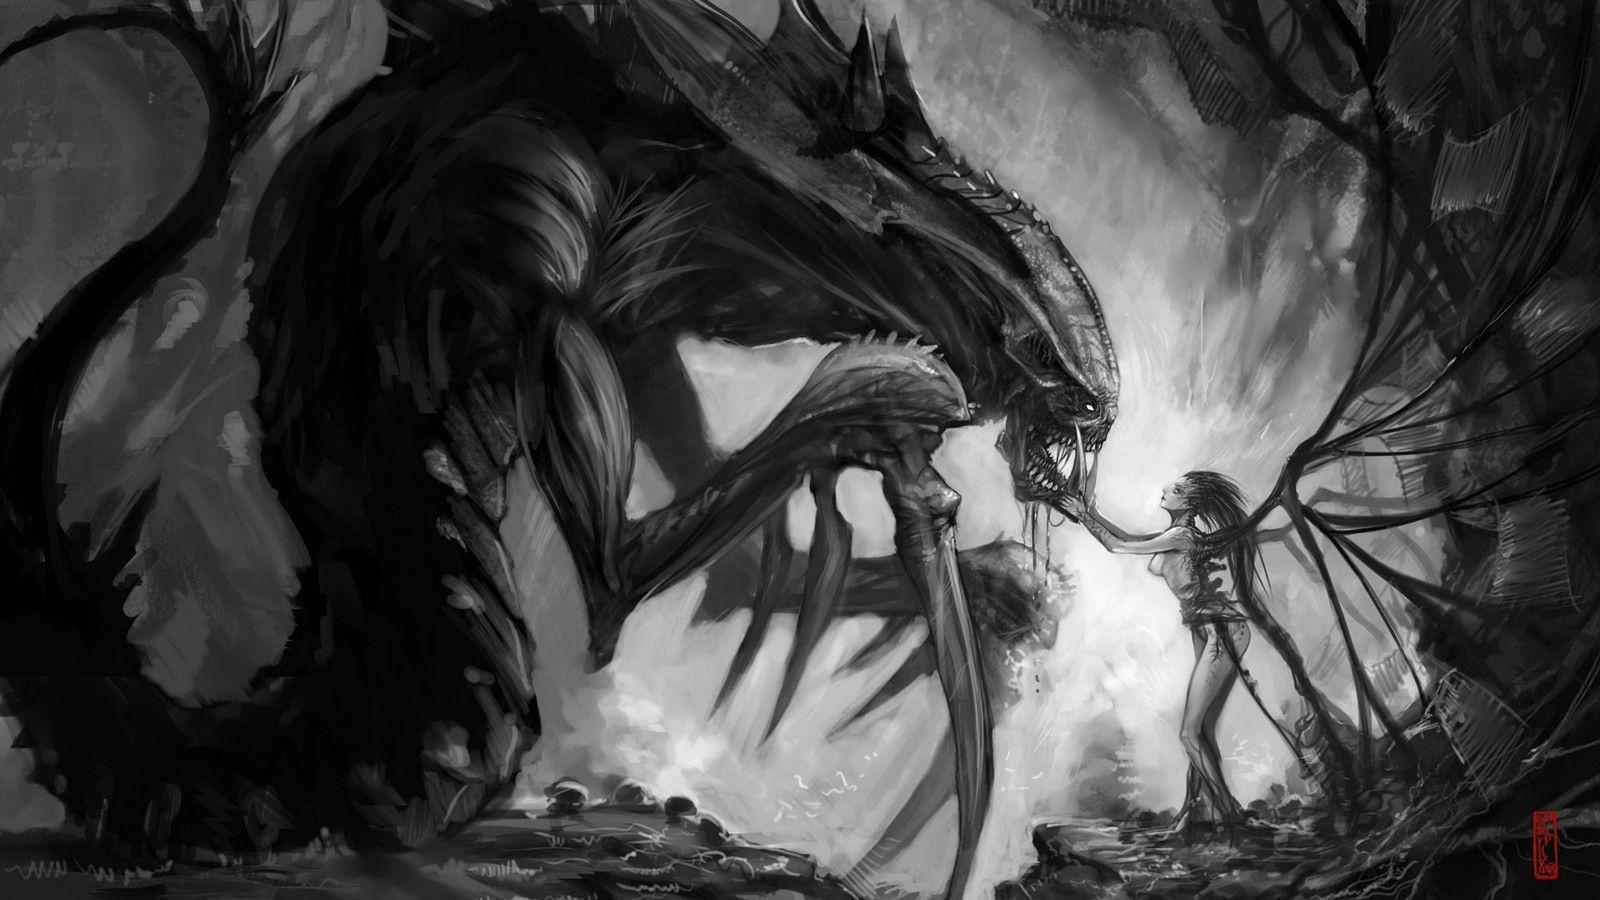 StarCraft 2 Zerg Wallpapers - Wallpaper Cave